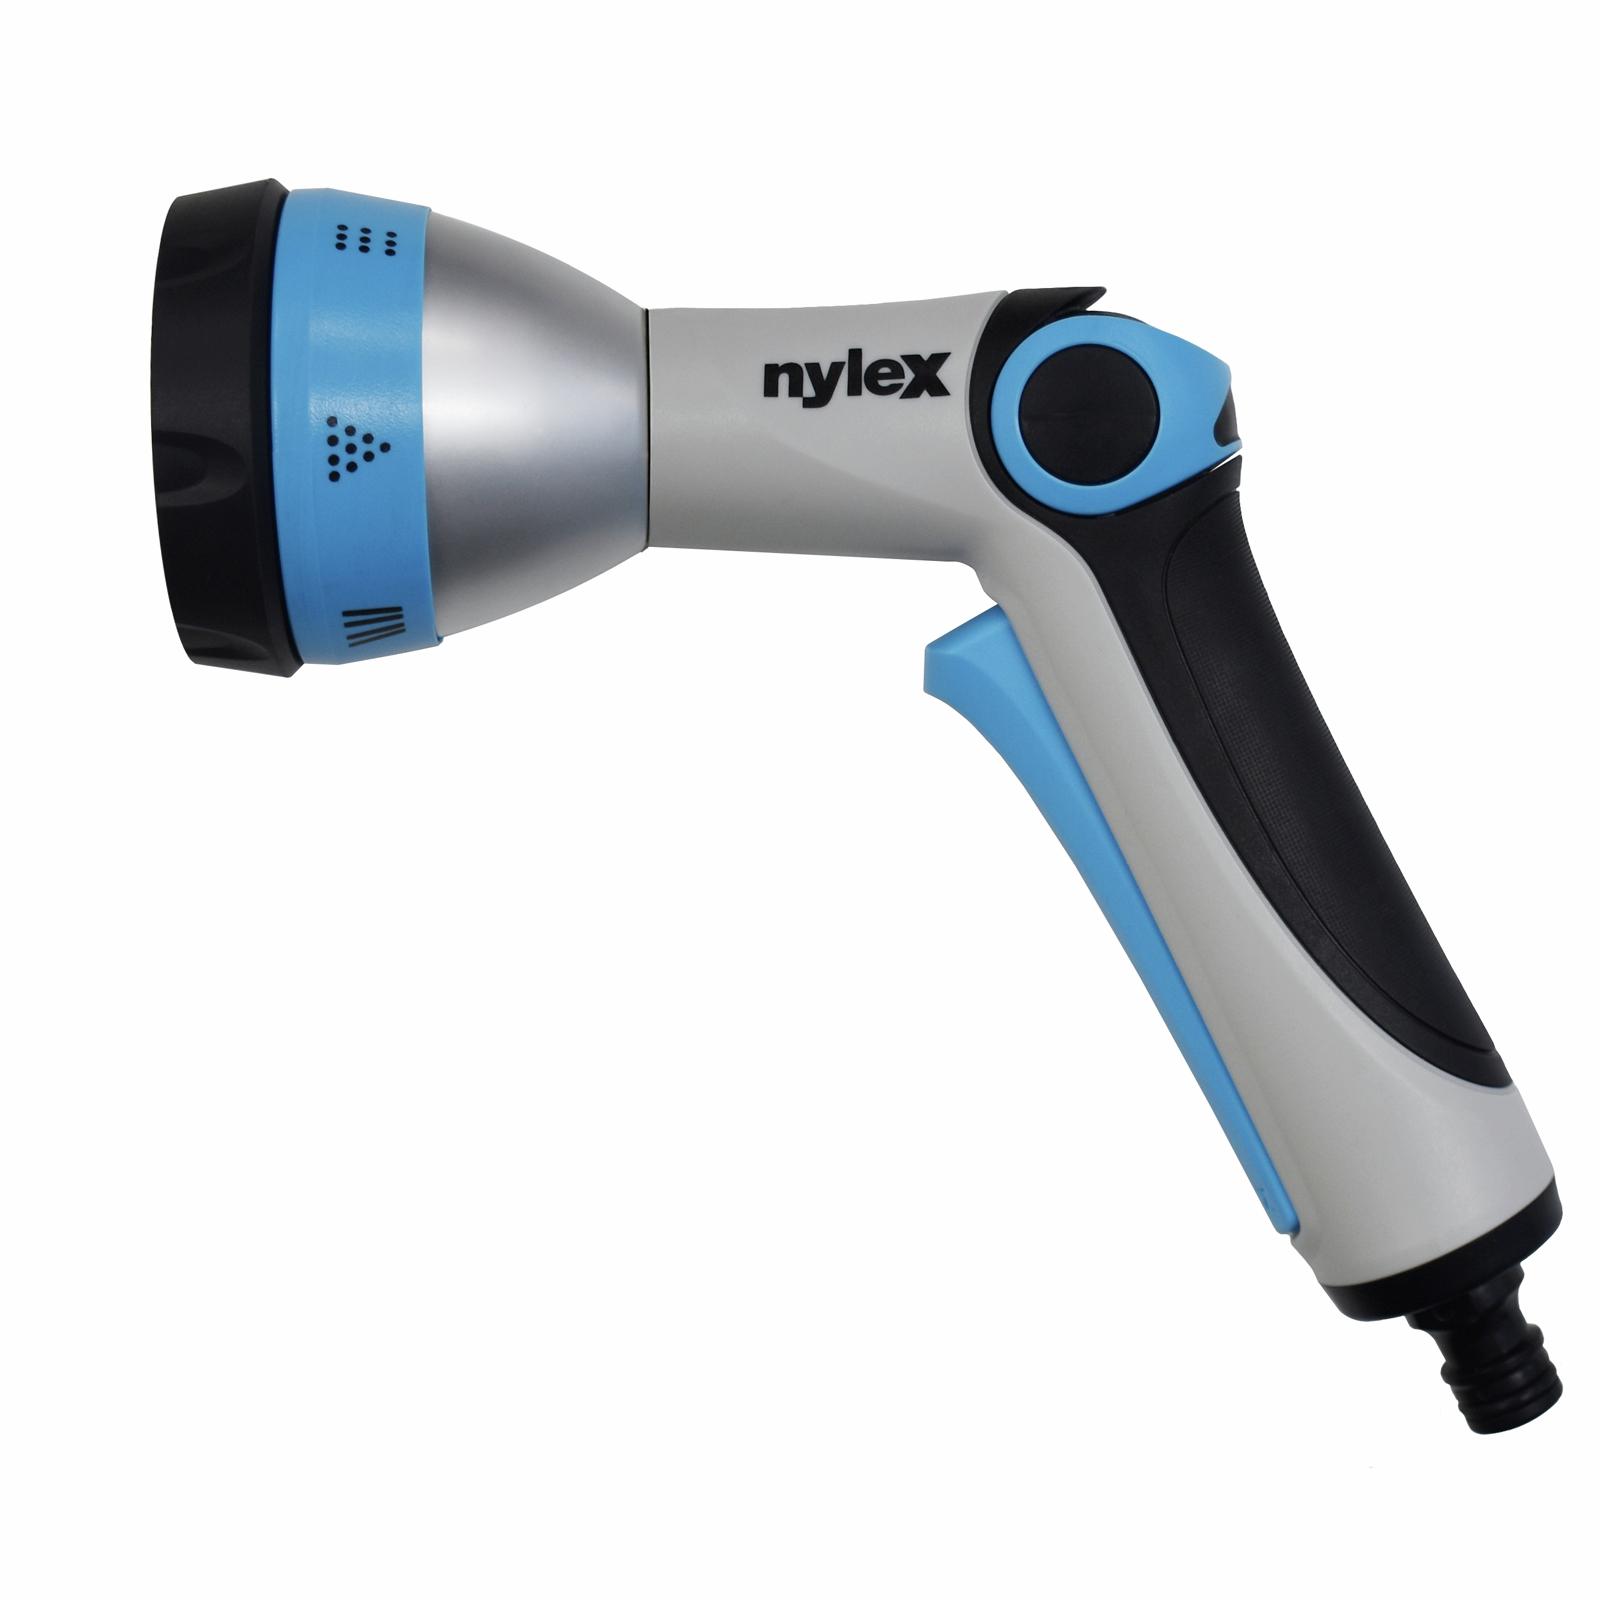 Nylex Premium Multi-Function Spray Gun